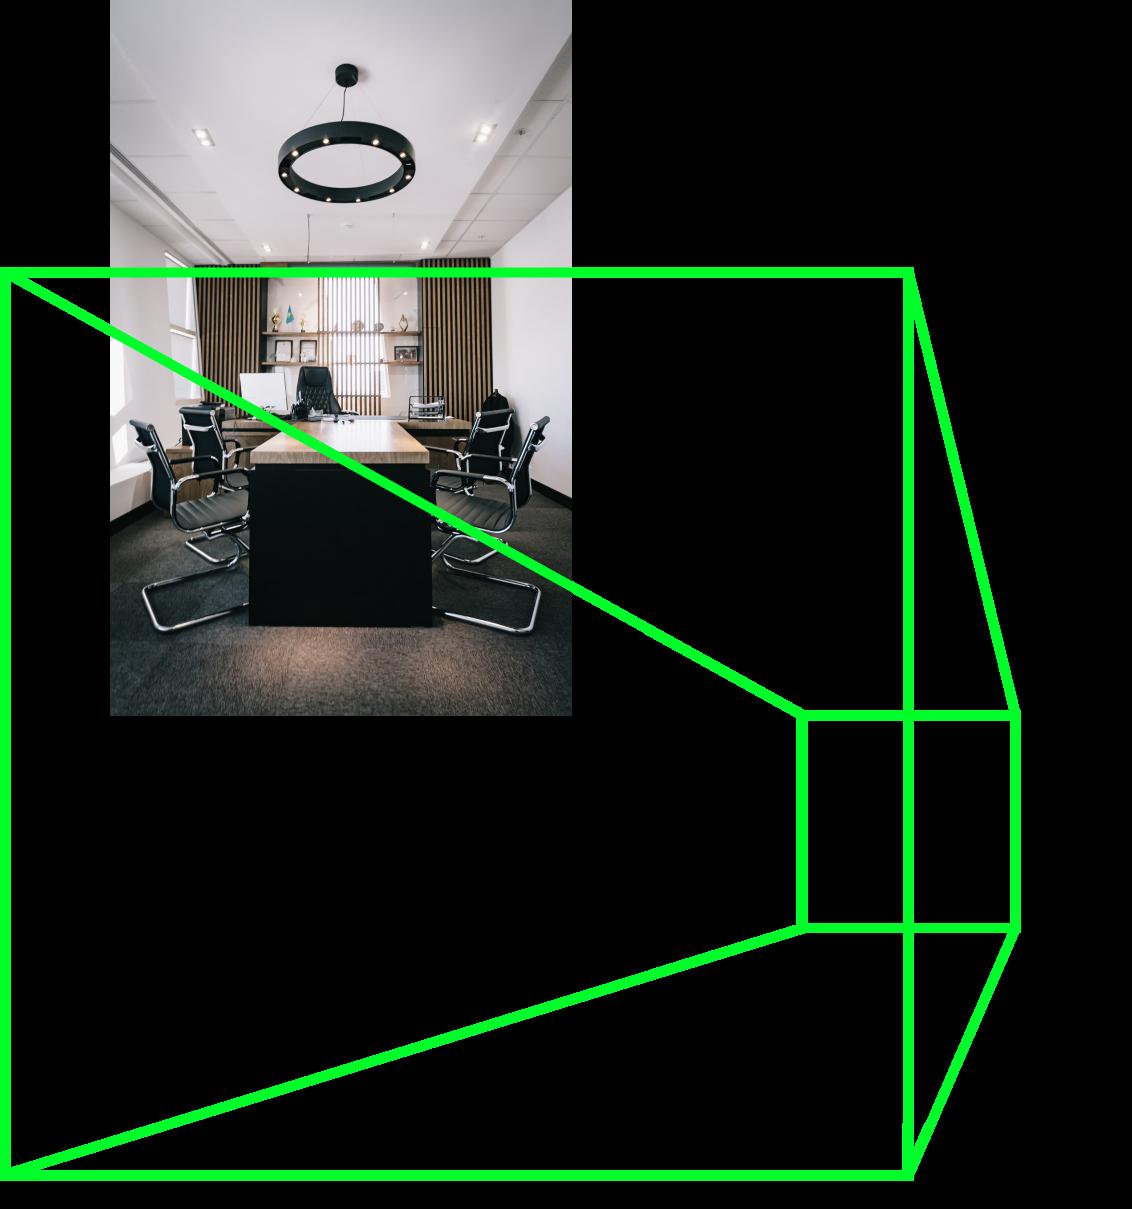 An empty office room